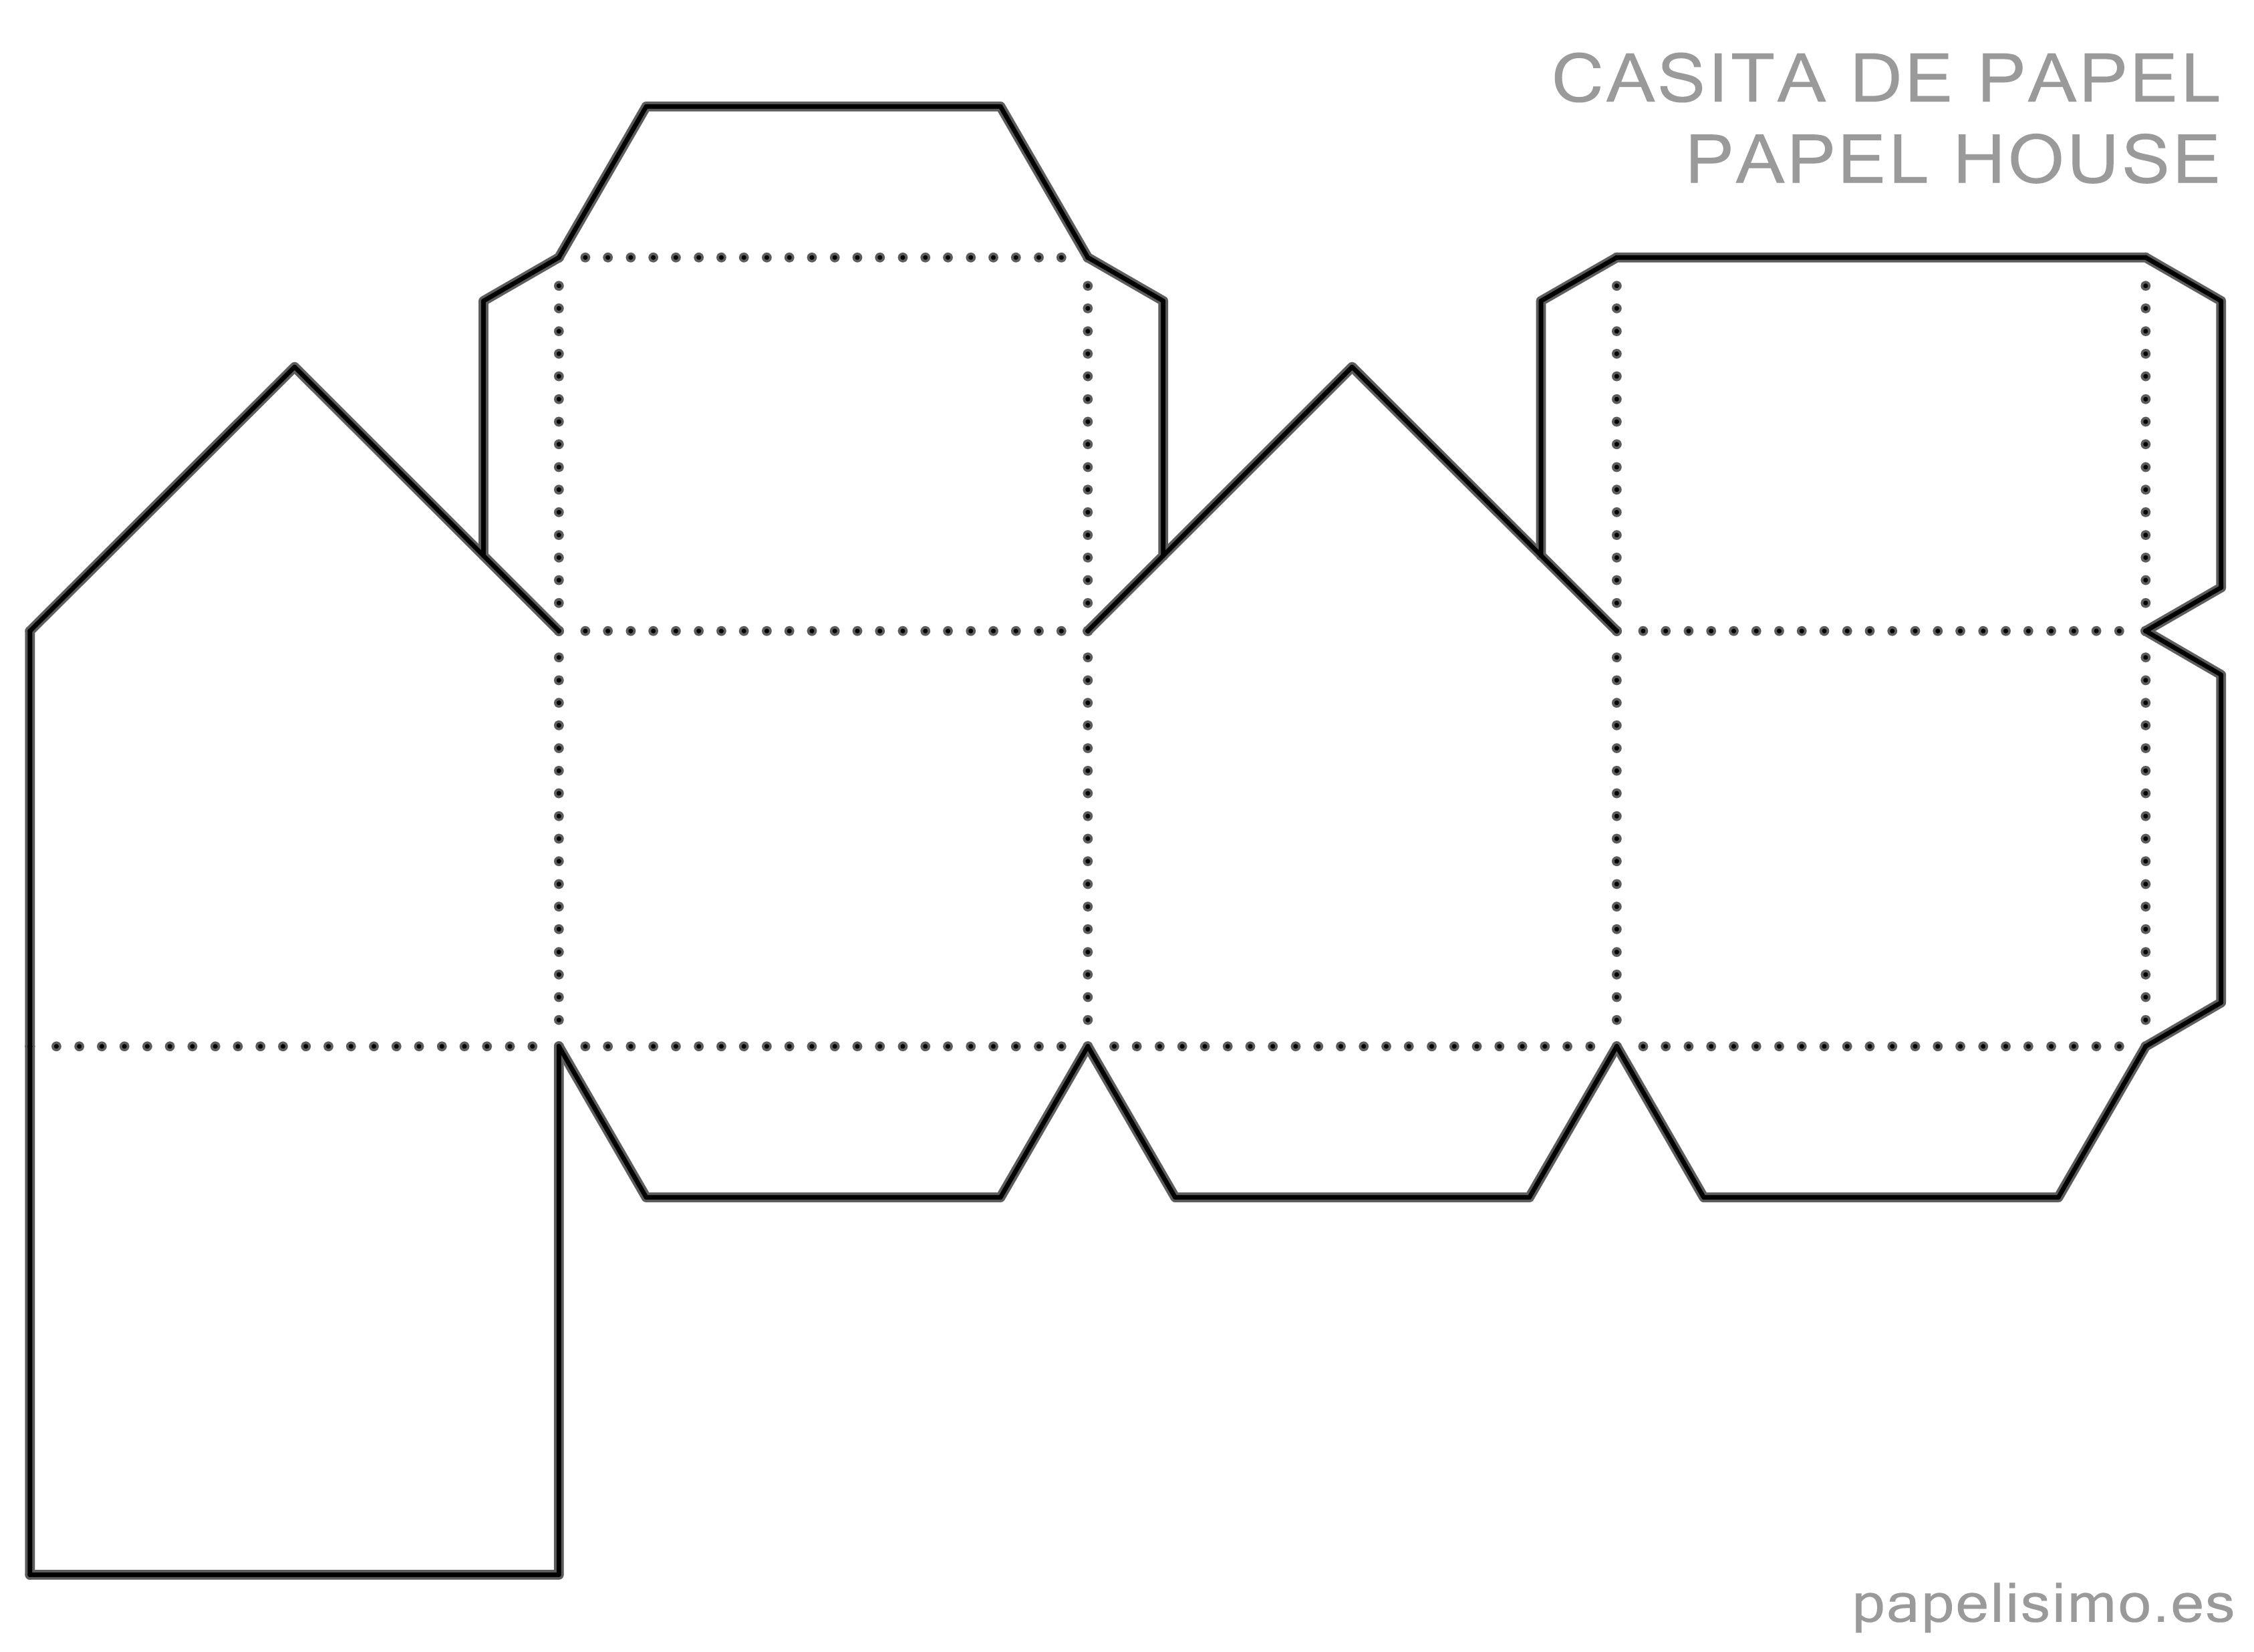 Plantilla casa de papel Paper house Printable | accesorios del hogar ...